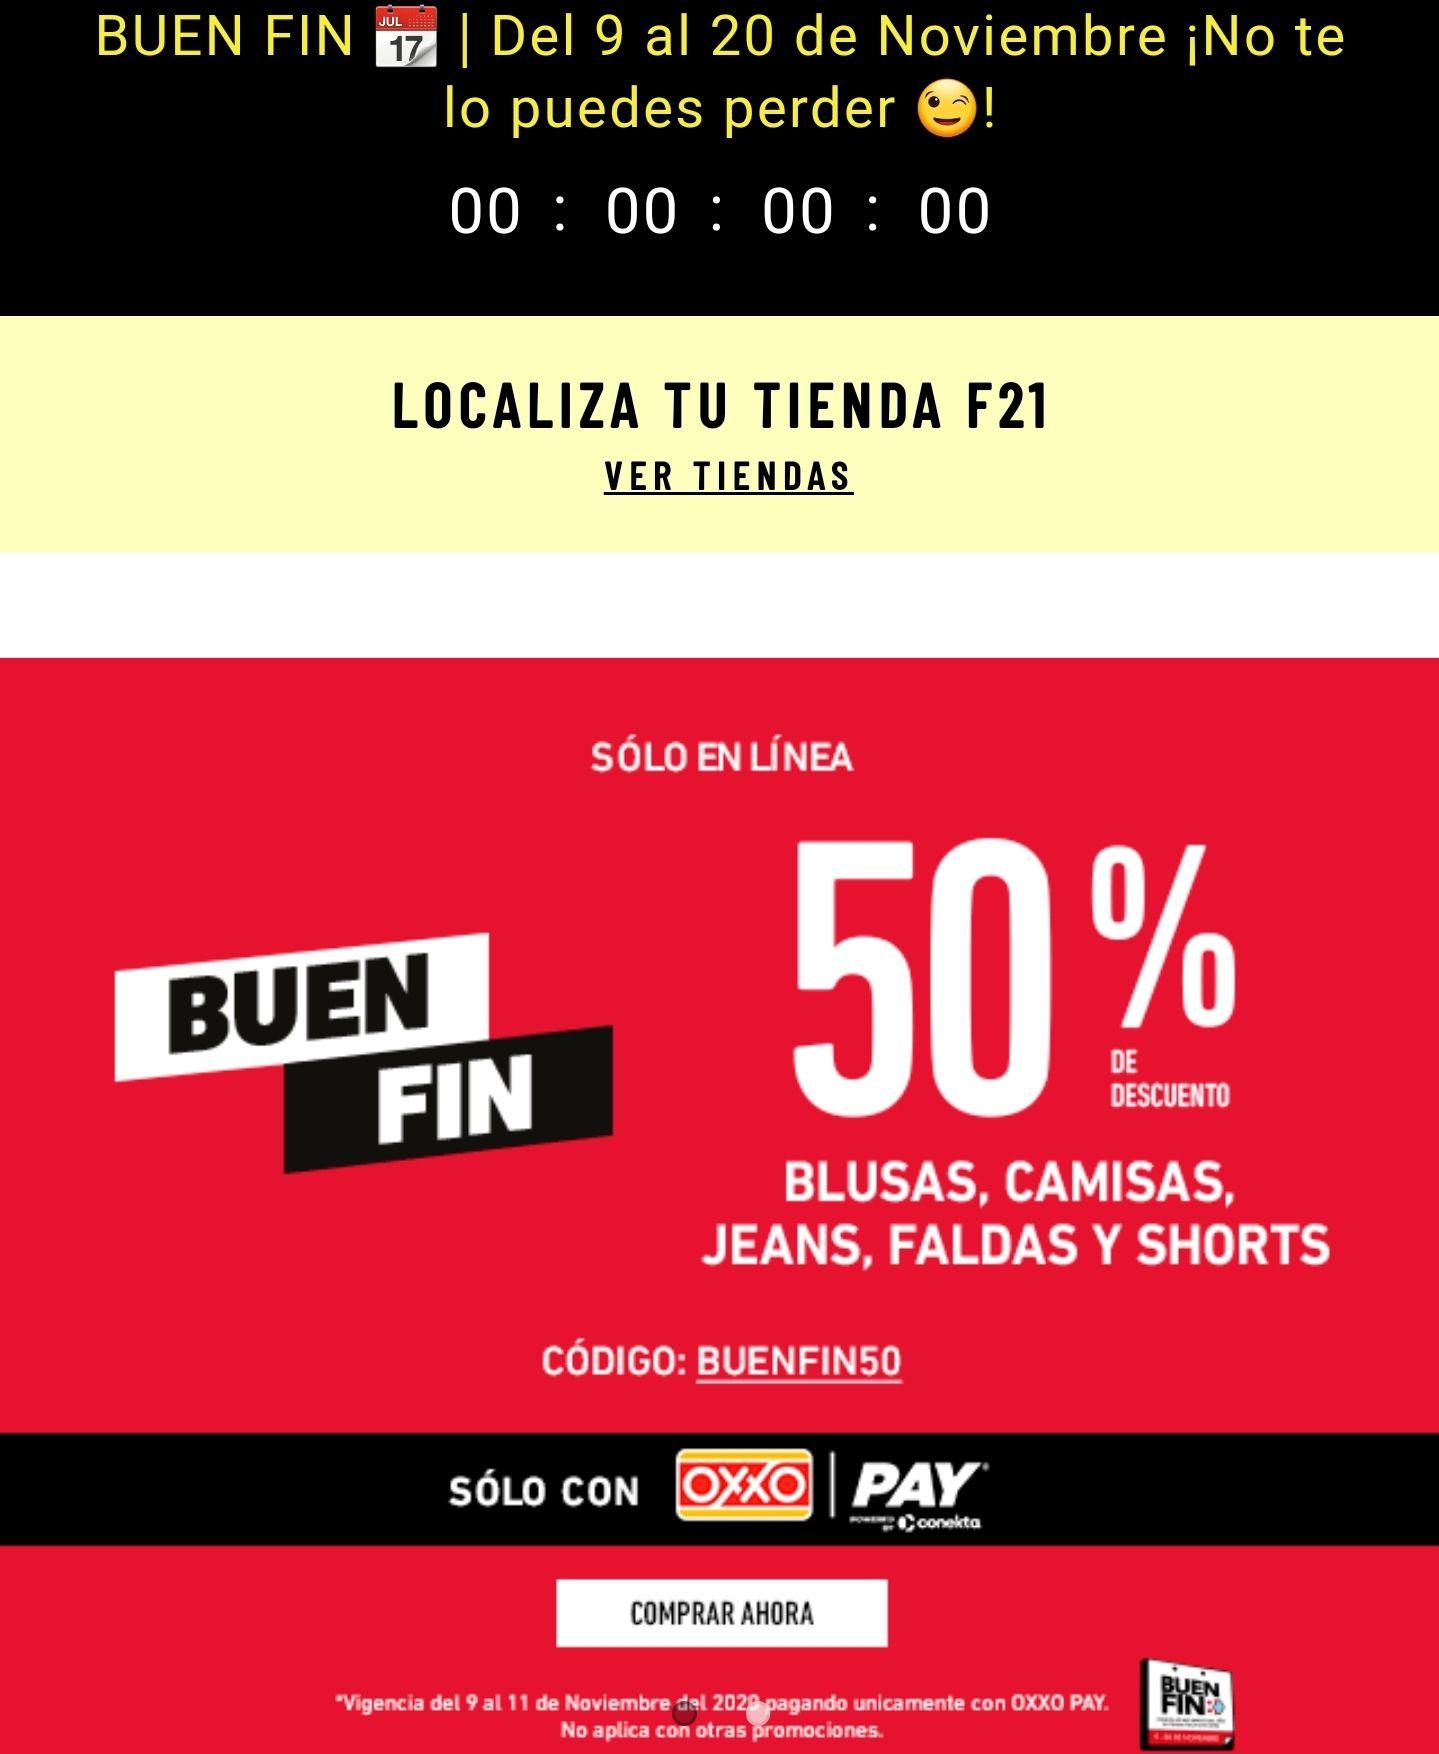 Ofertas Buen Fin 2020 Forever21: 50% Utilizando cupón BUENFIN50 y Oxxo Pay